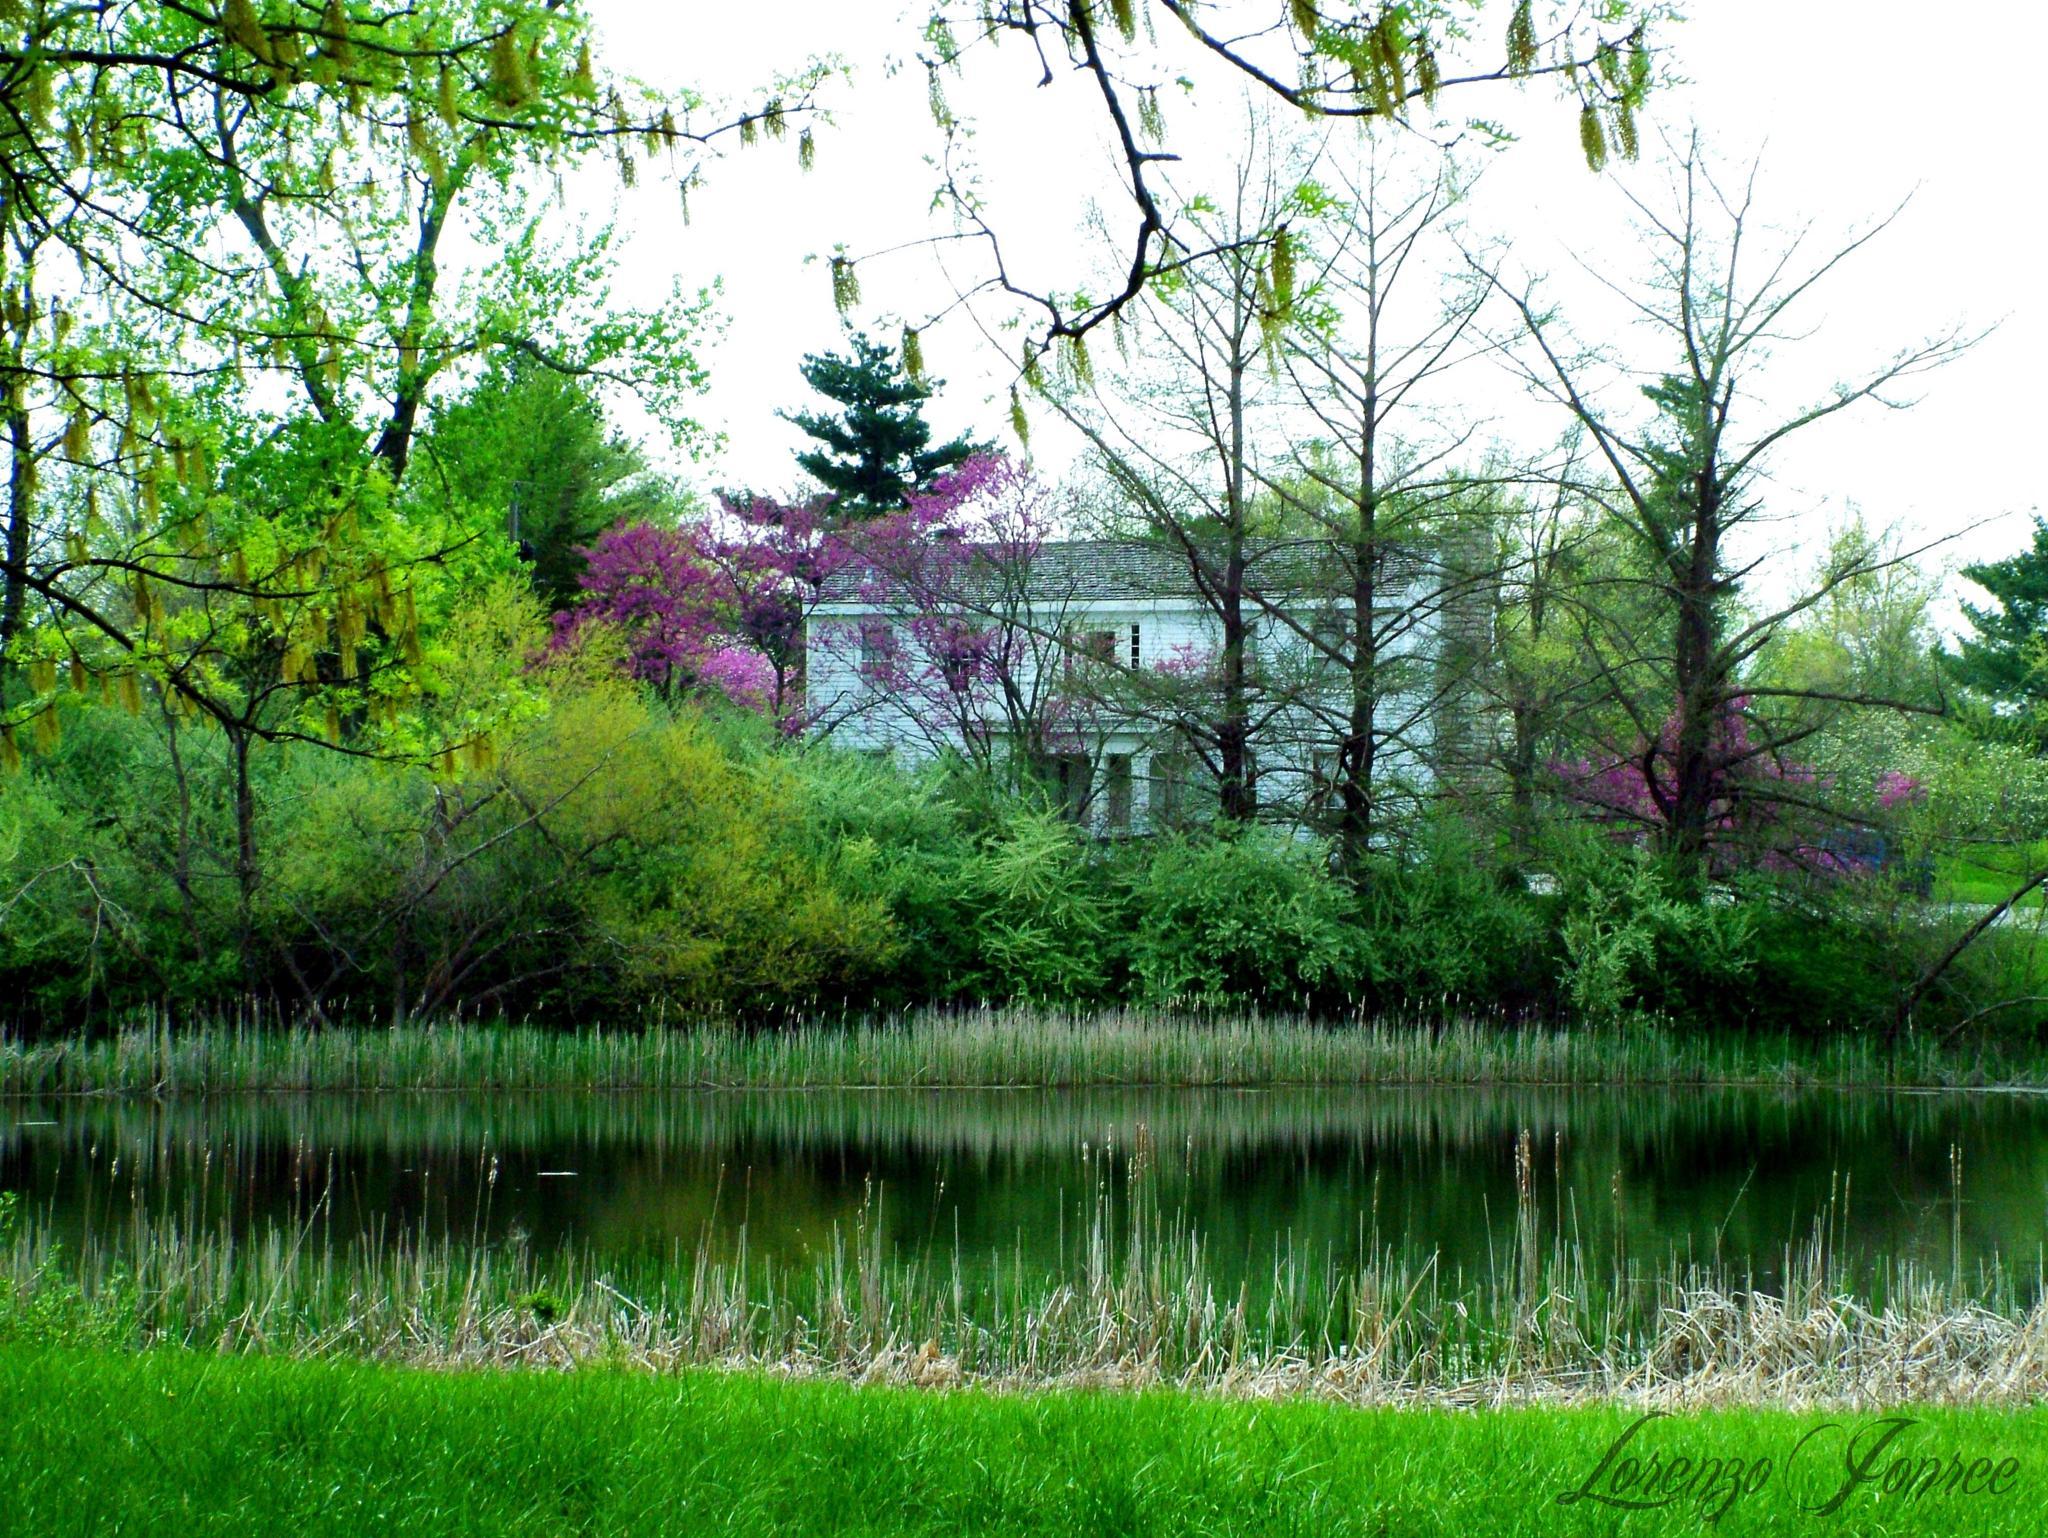 Across The Pond      1 of 2  by Lorenzo (Larry) Jonree